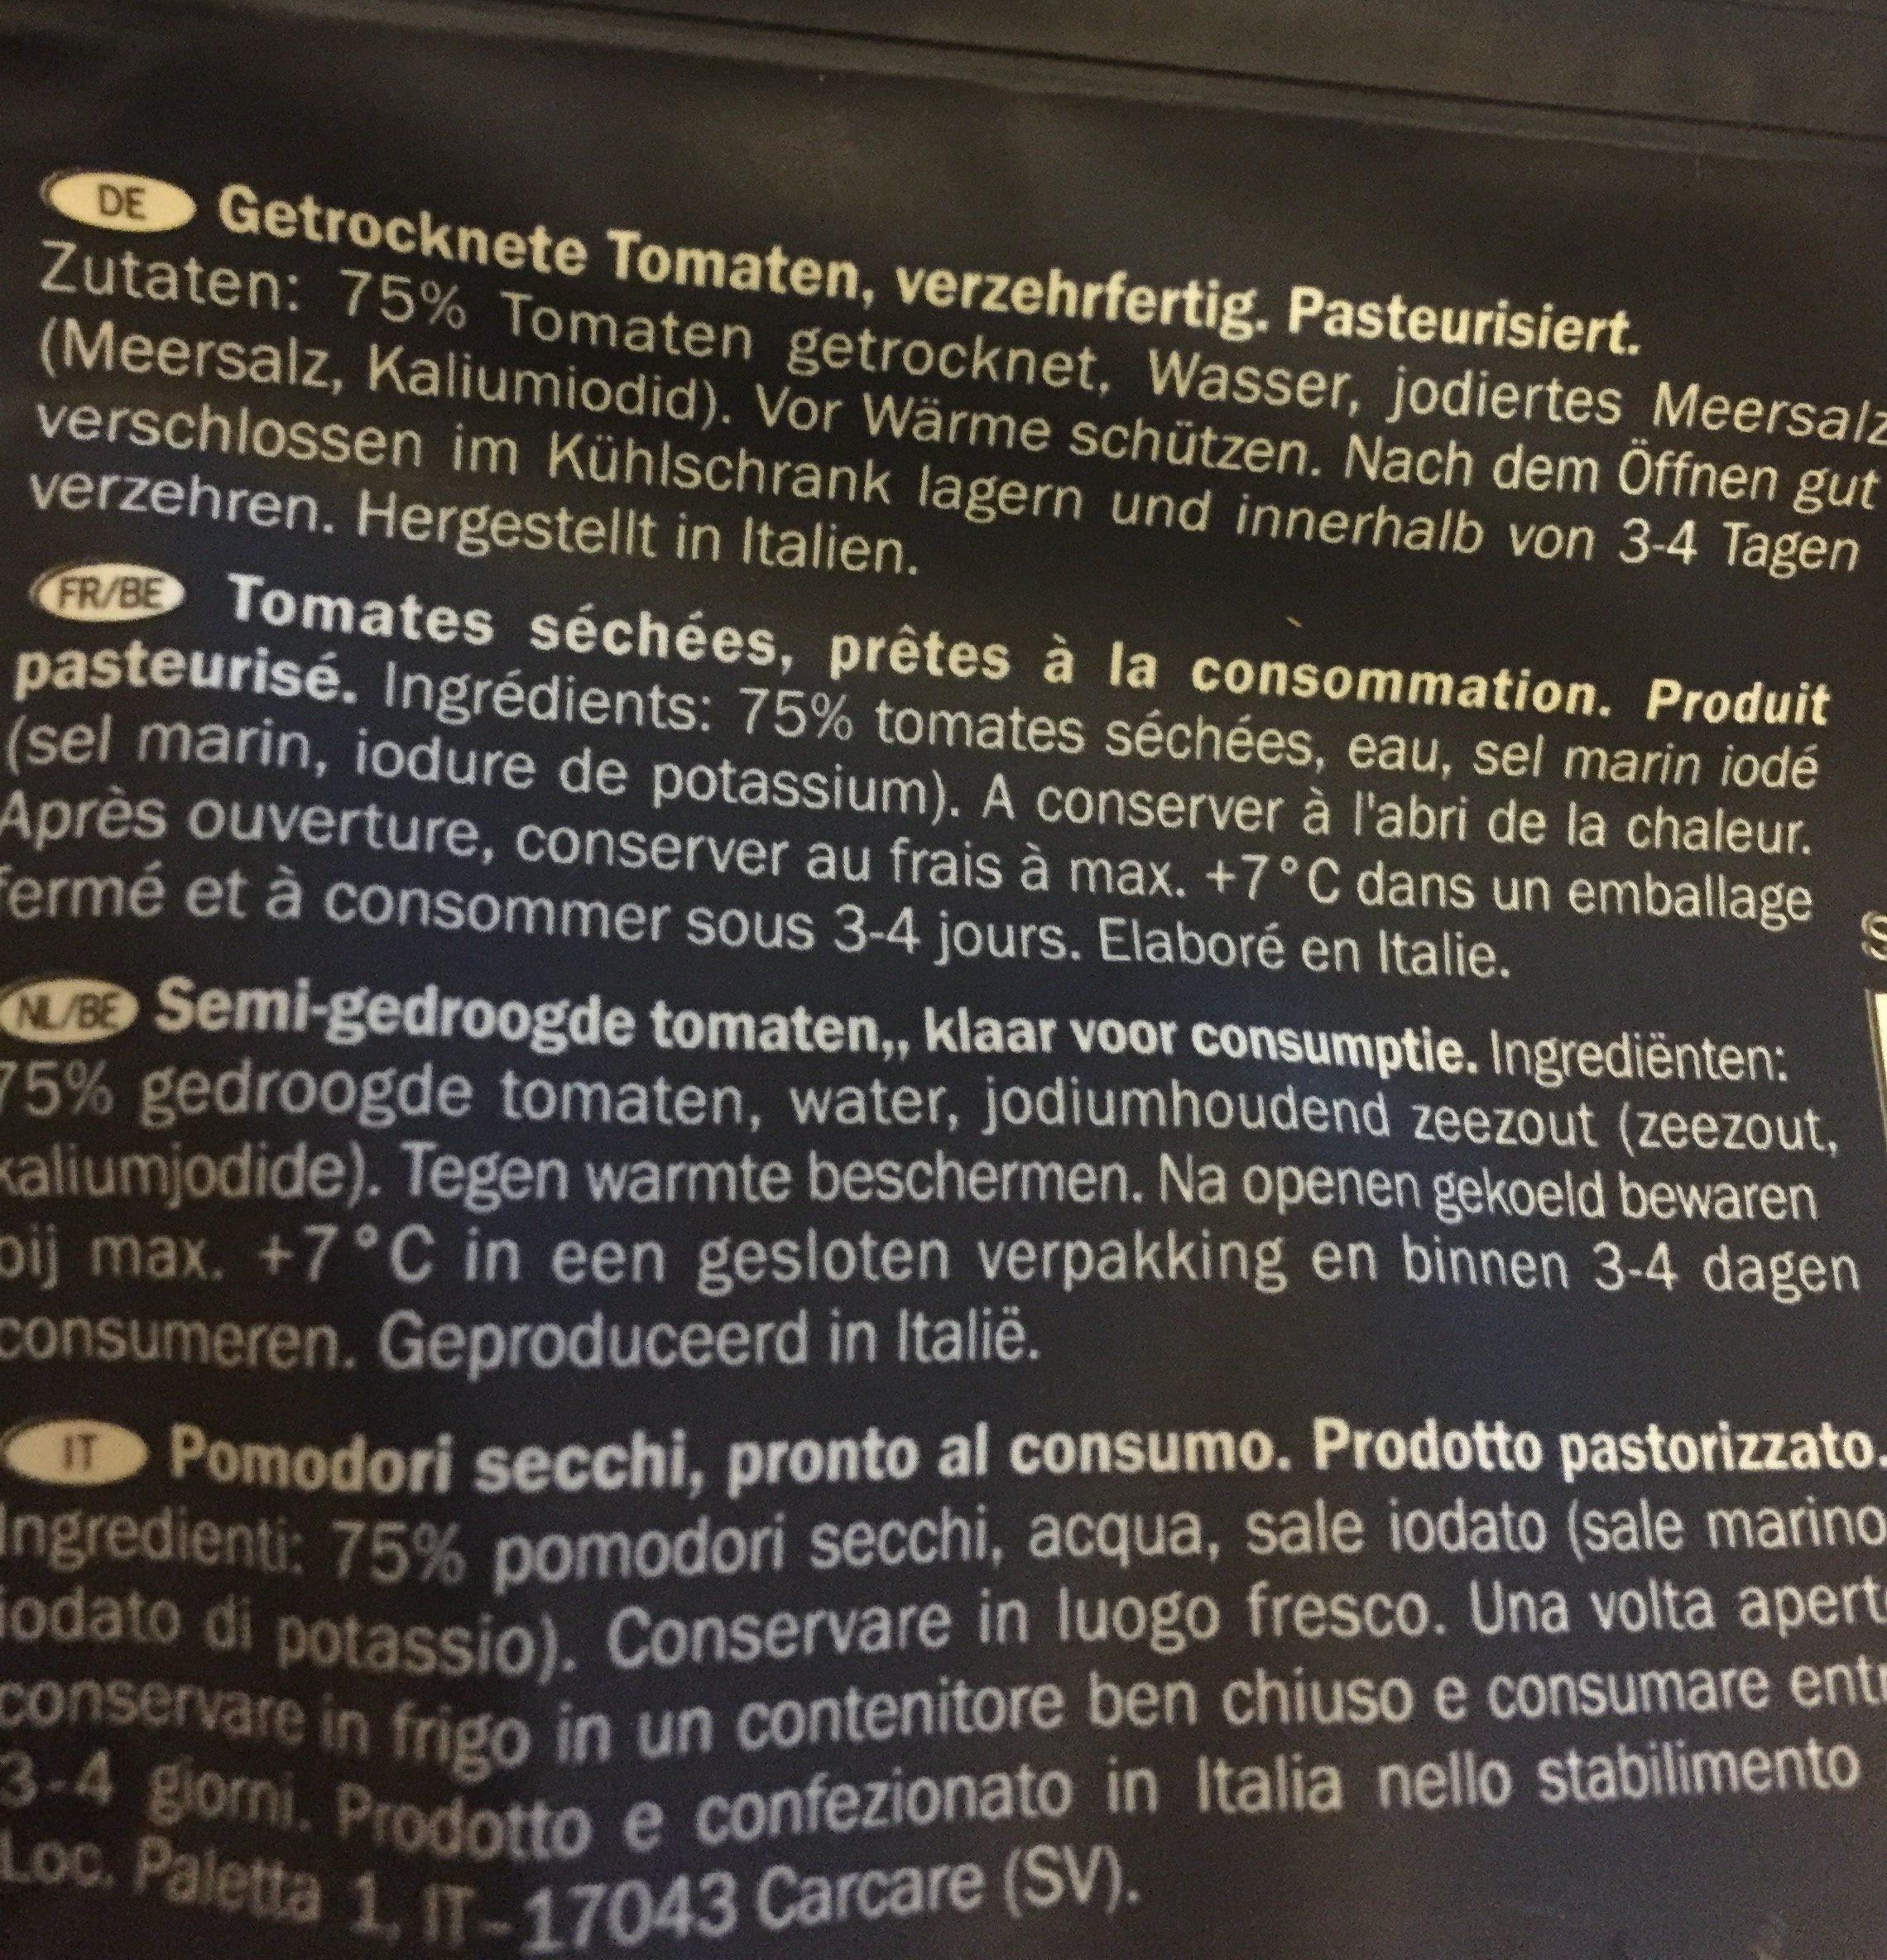 Pomodori Secchi, Getrocknete Softtomaten - Ingredients - fr